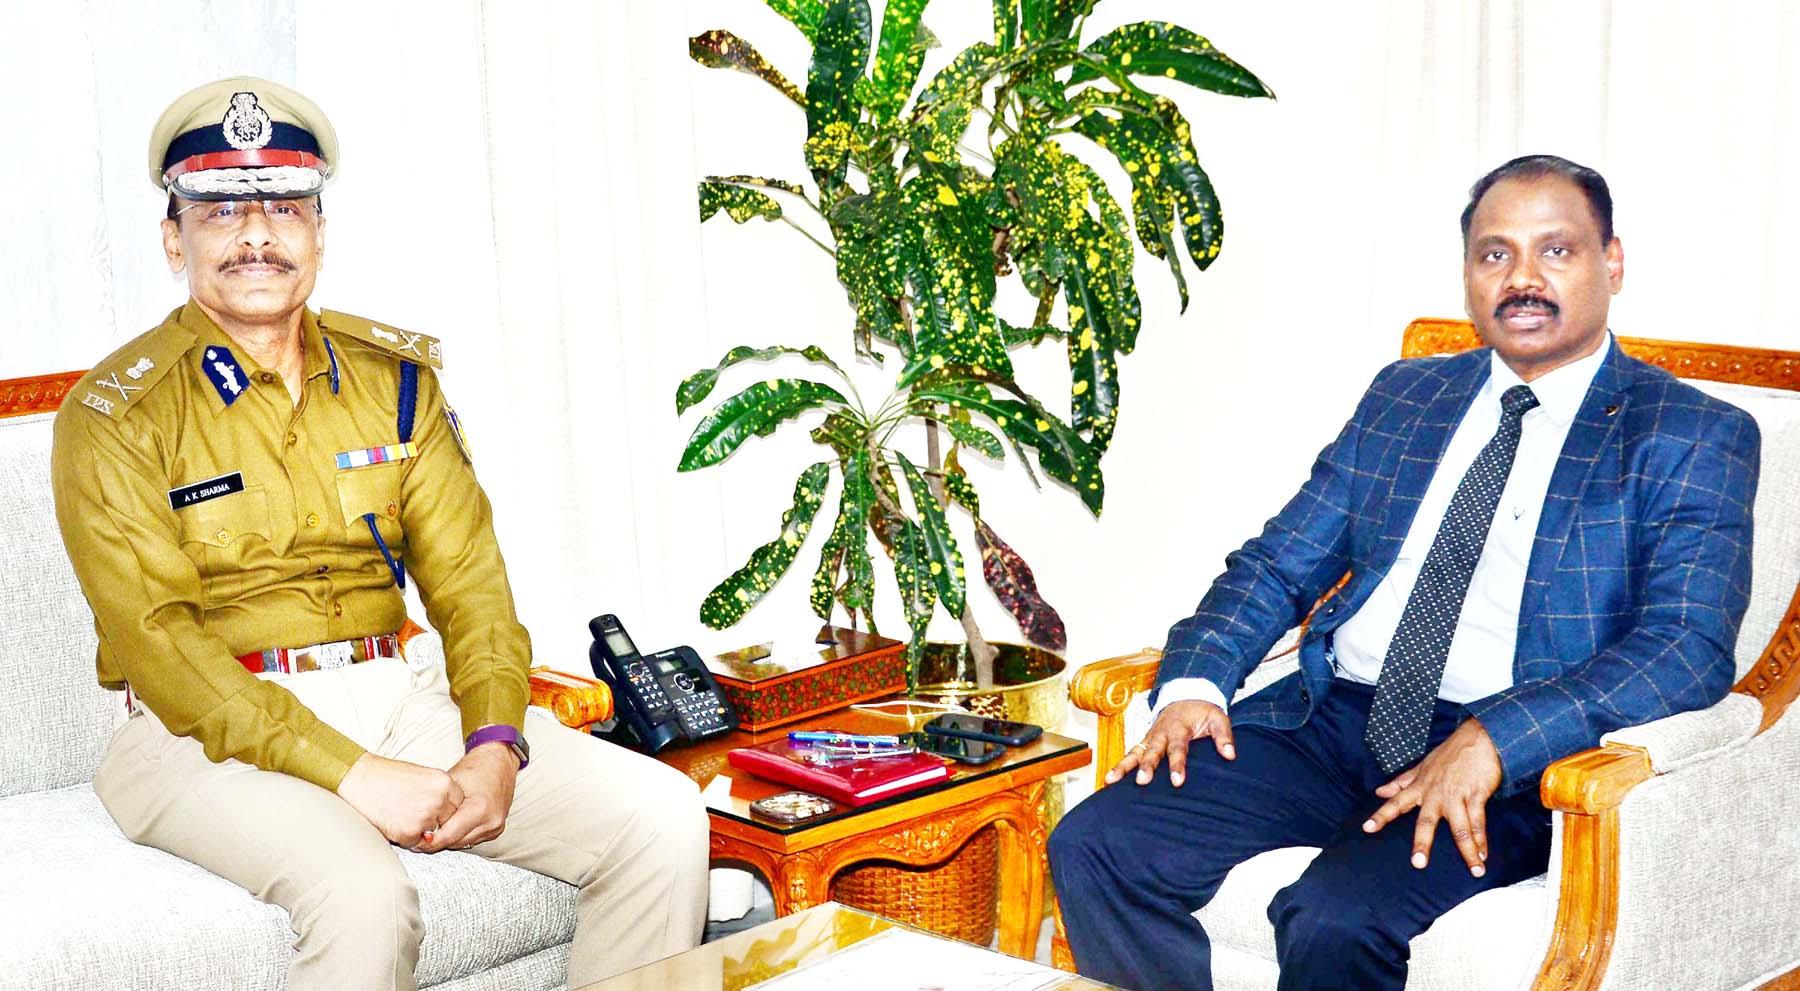 ADG CRPF, Arun Kumar Sharma during a meeting with Lieutenant Governor GC Murmu in Jammu on Monday.